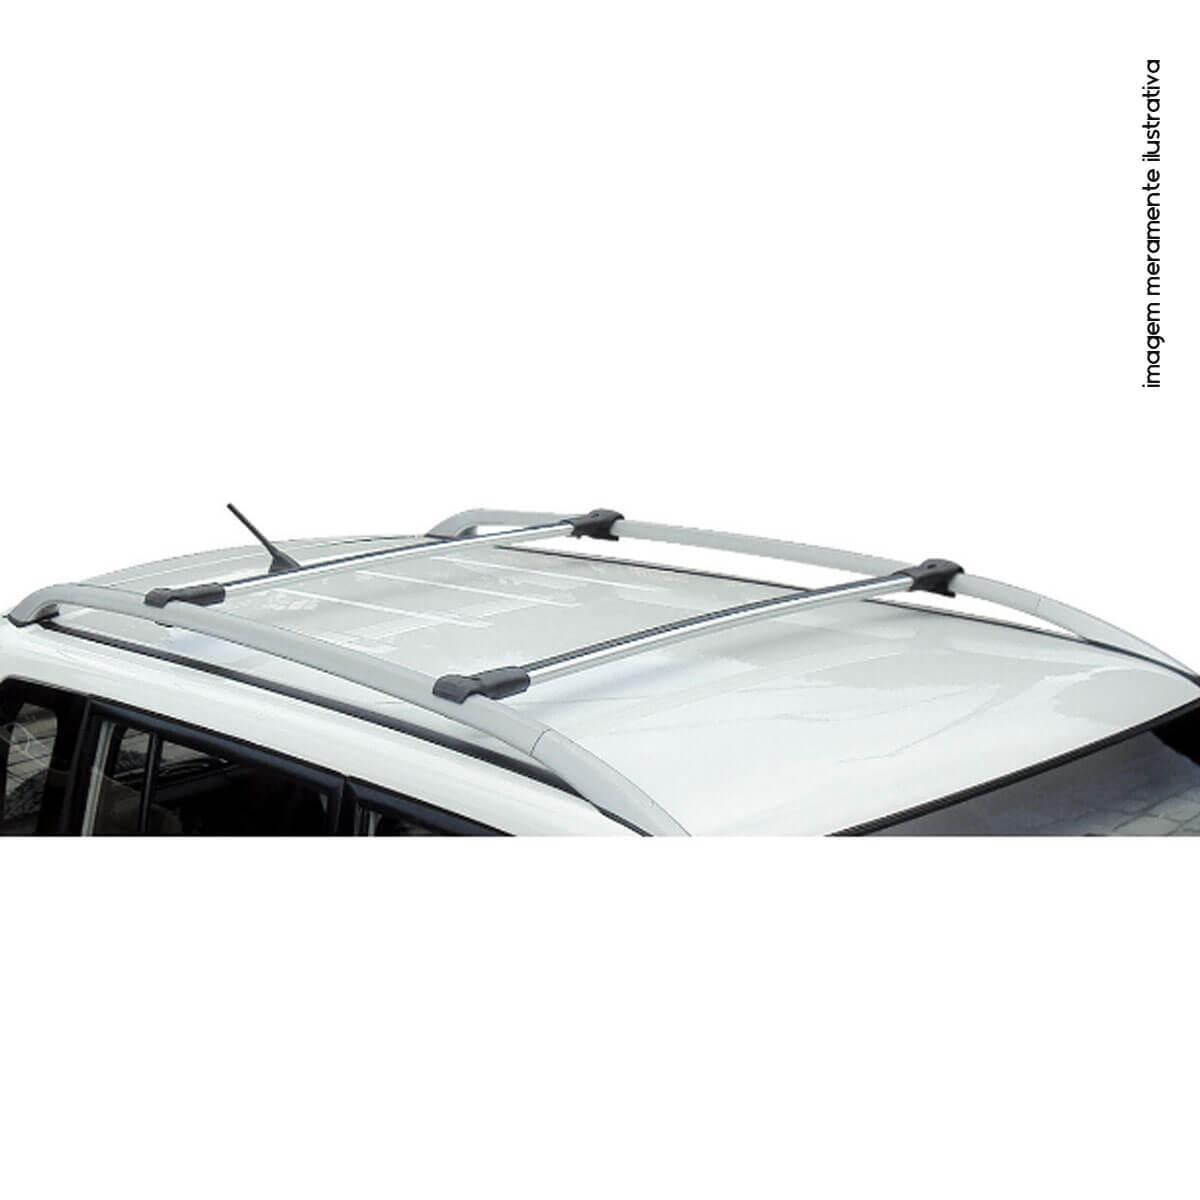 Travessa rack de teto larga alumínio S10 cabine dupla 2009 a 2011